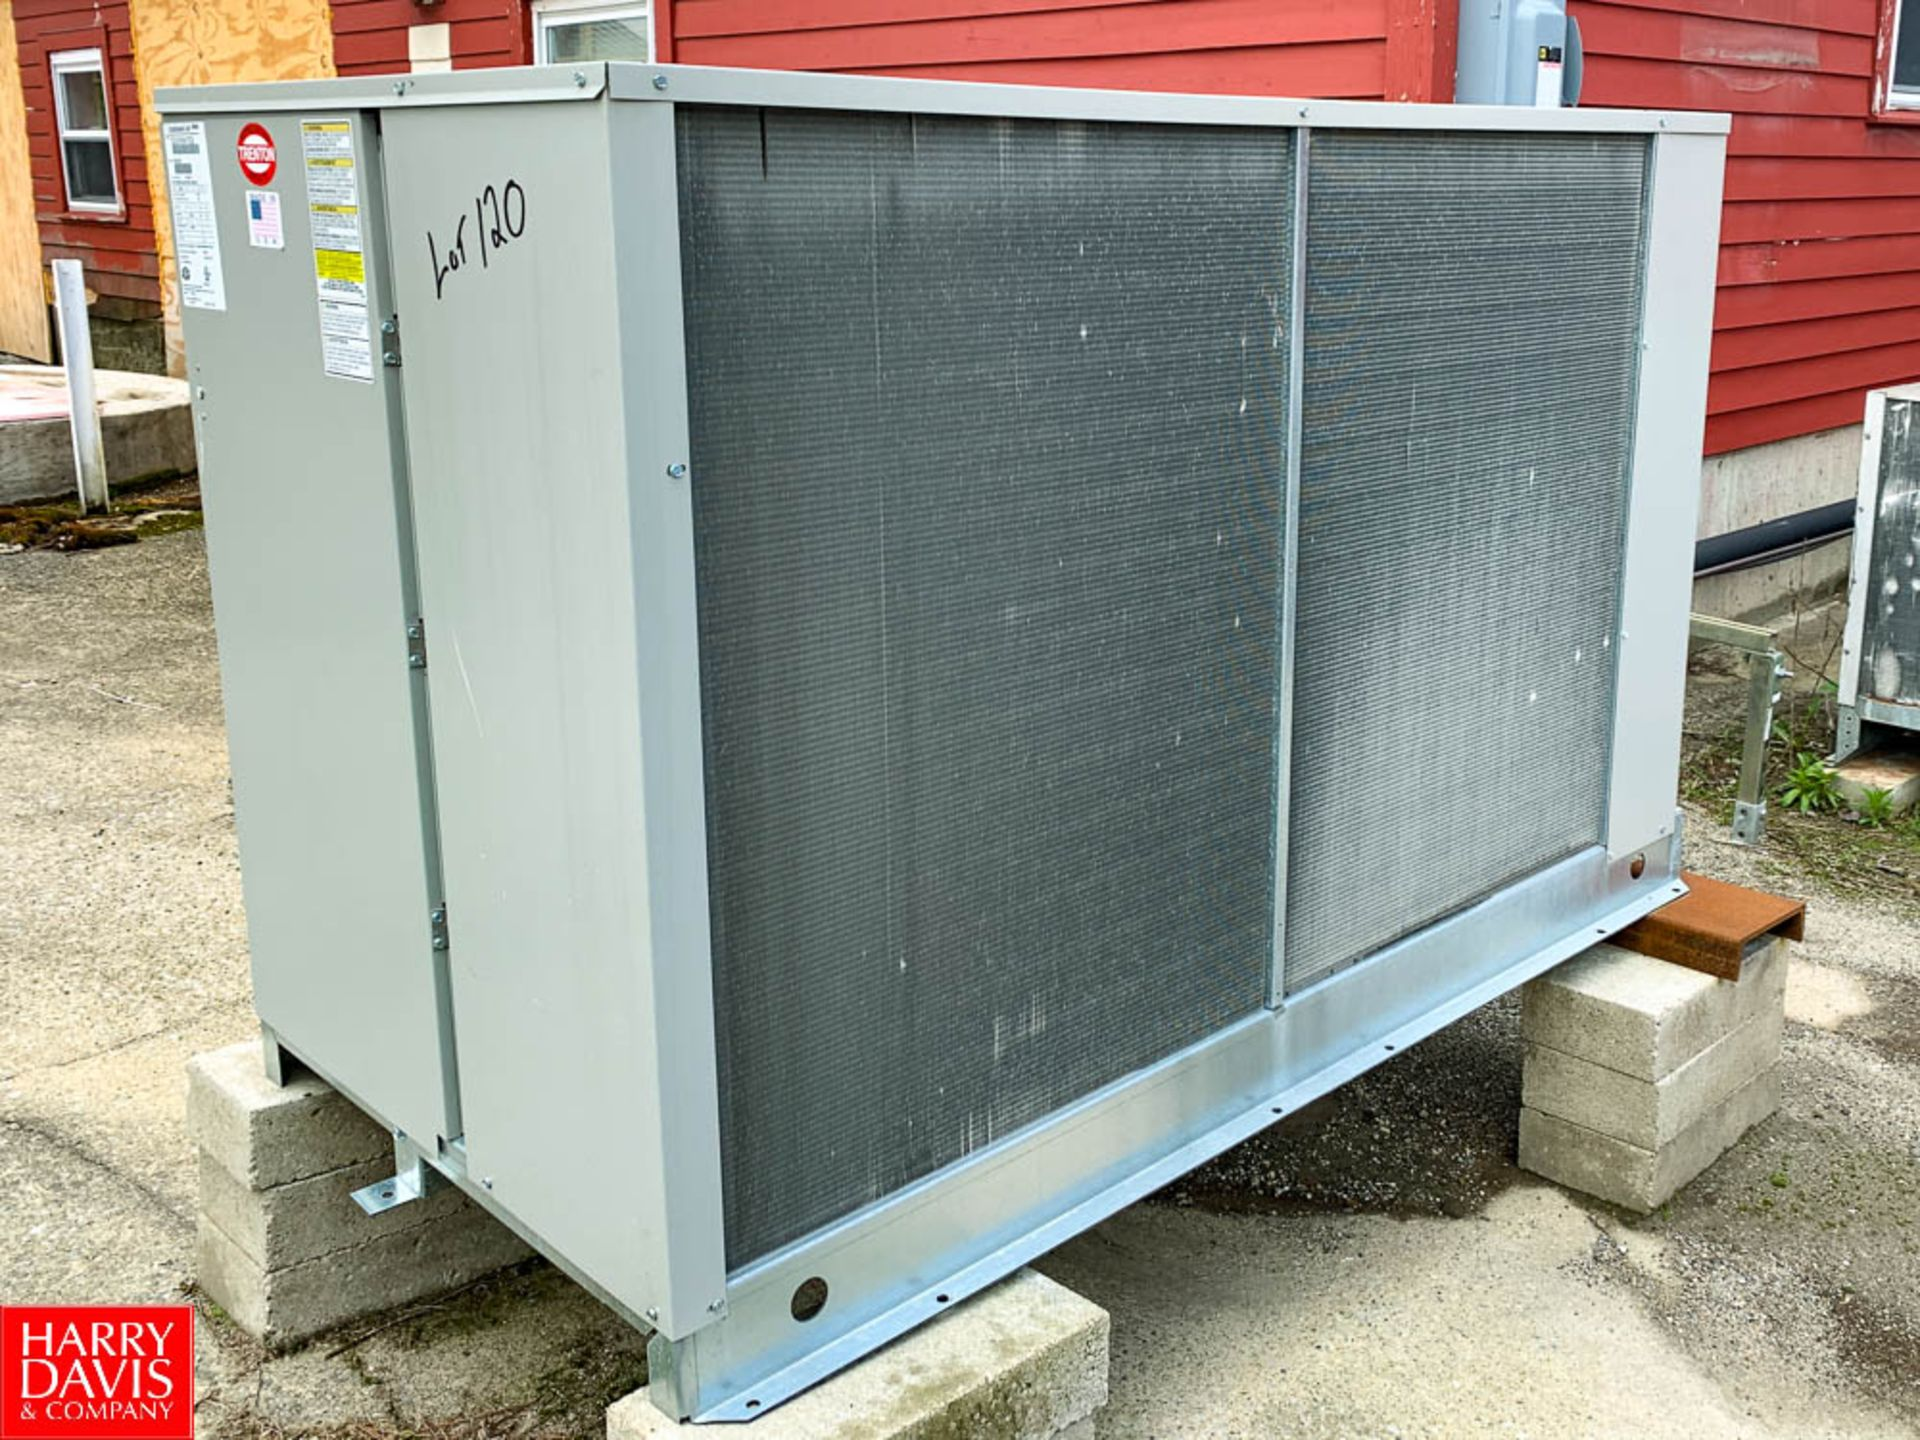 2019 Trenton Air Cooled Condensing Unit Model: TEZA076HSHTECB, S/N: 199204297, 450 PSI Working